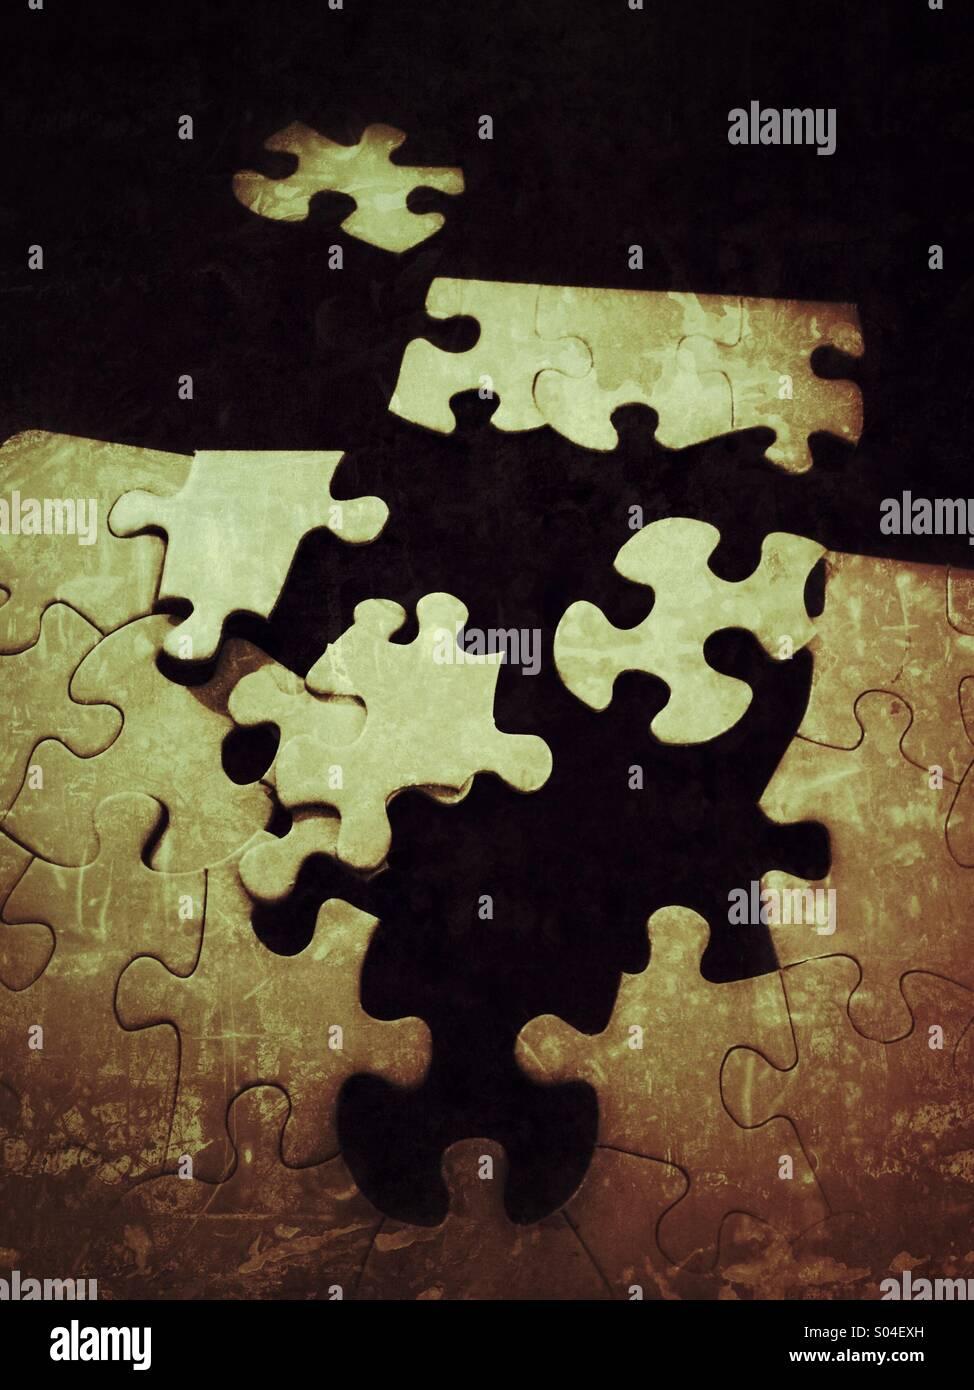 Puzzle inachevé Photo Stock